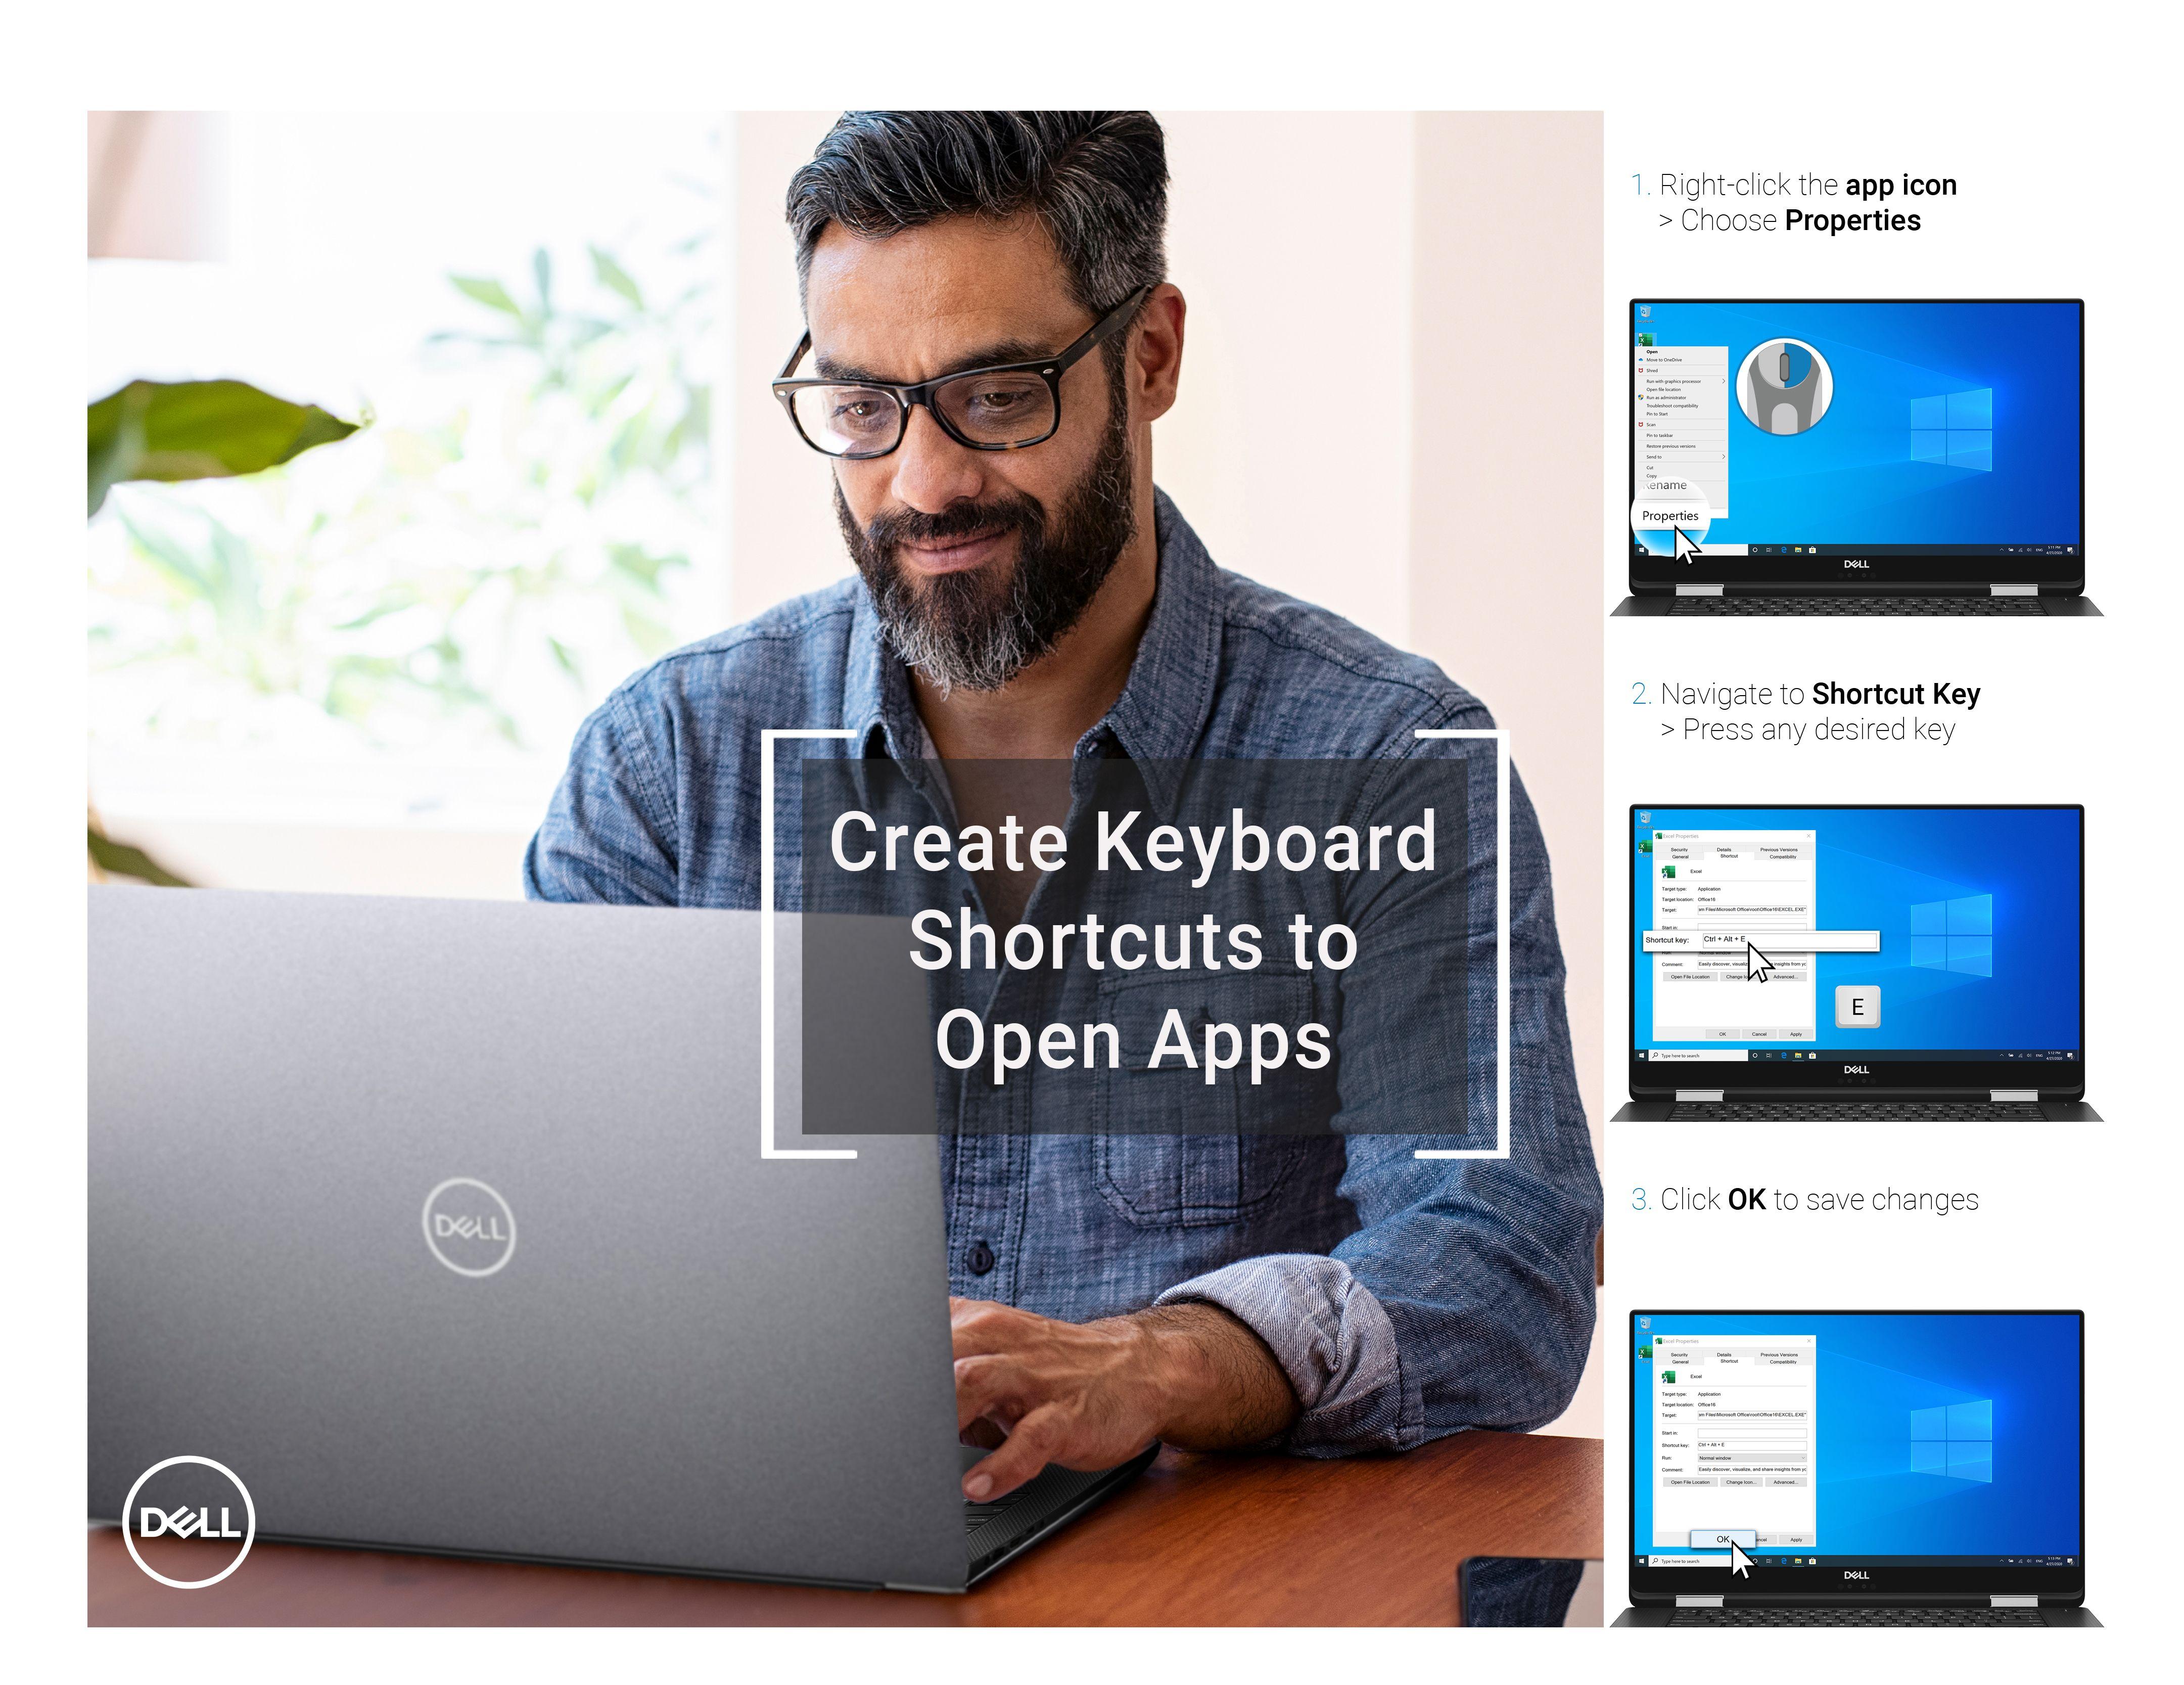 Adding keyboard shortcut to apps en 2020